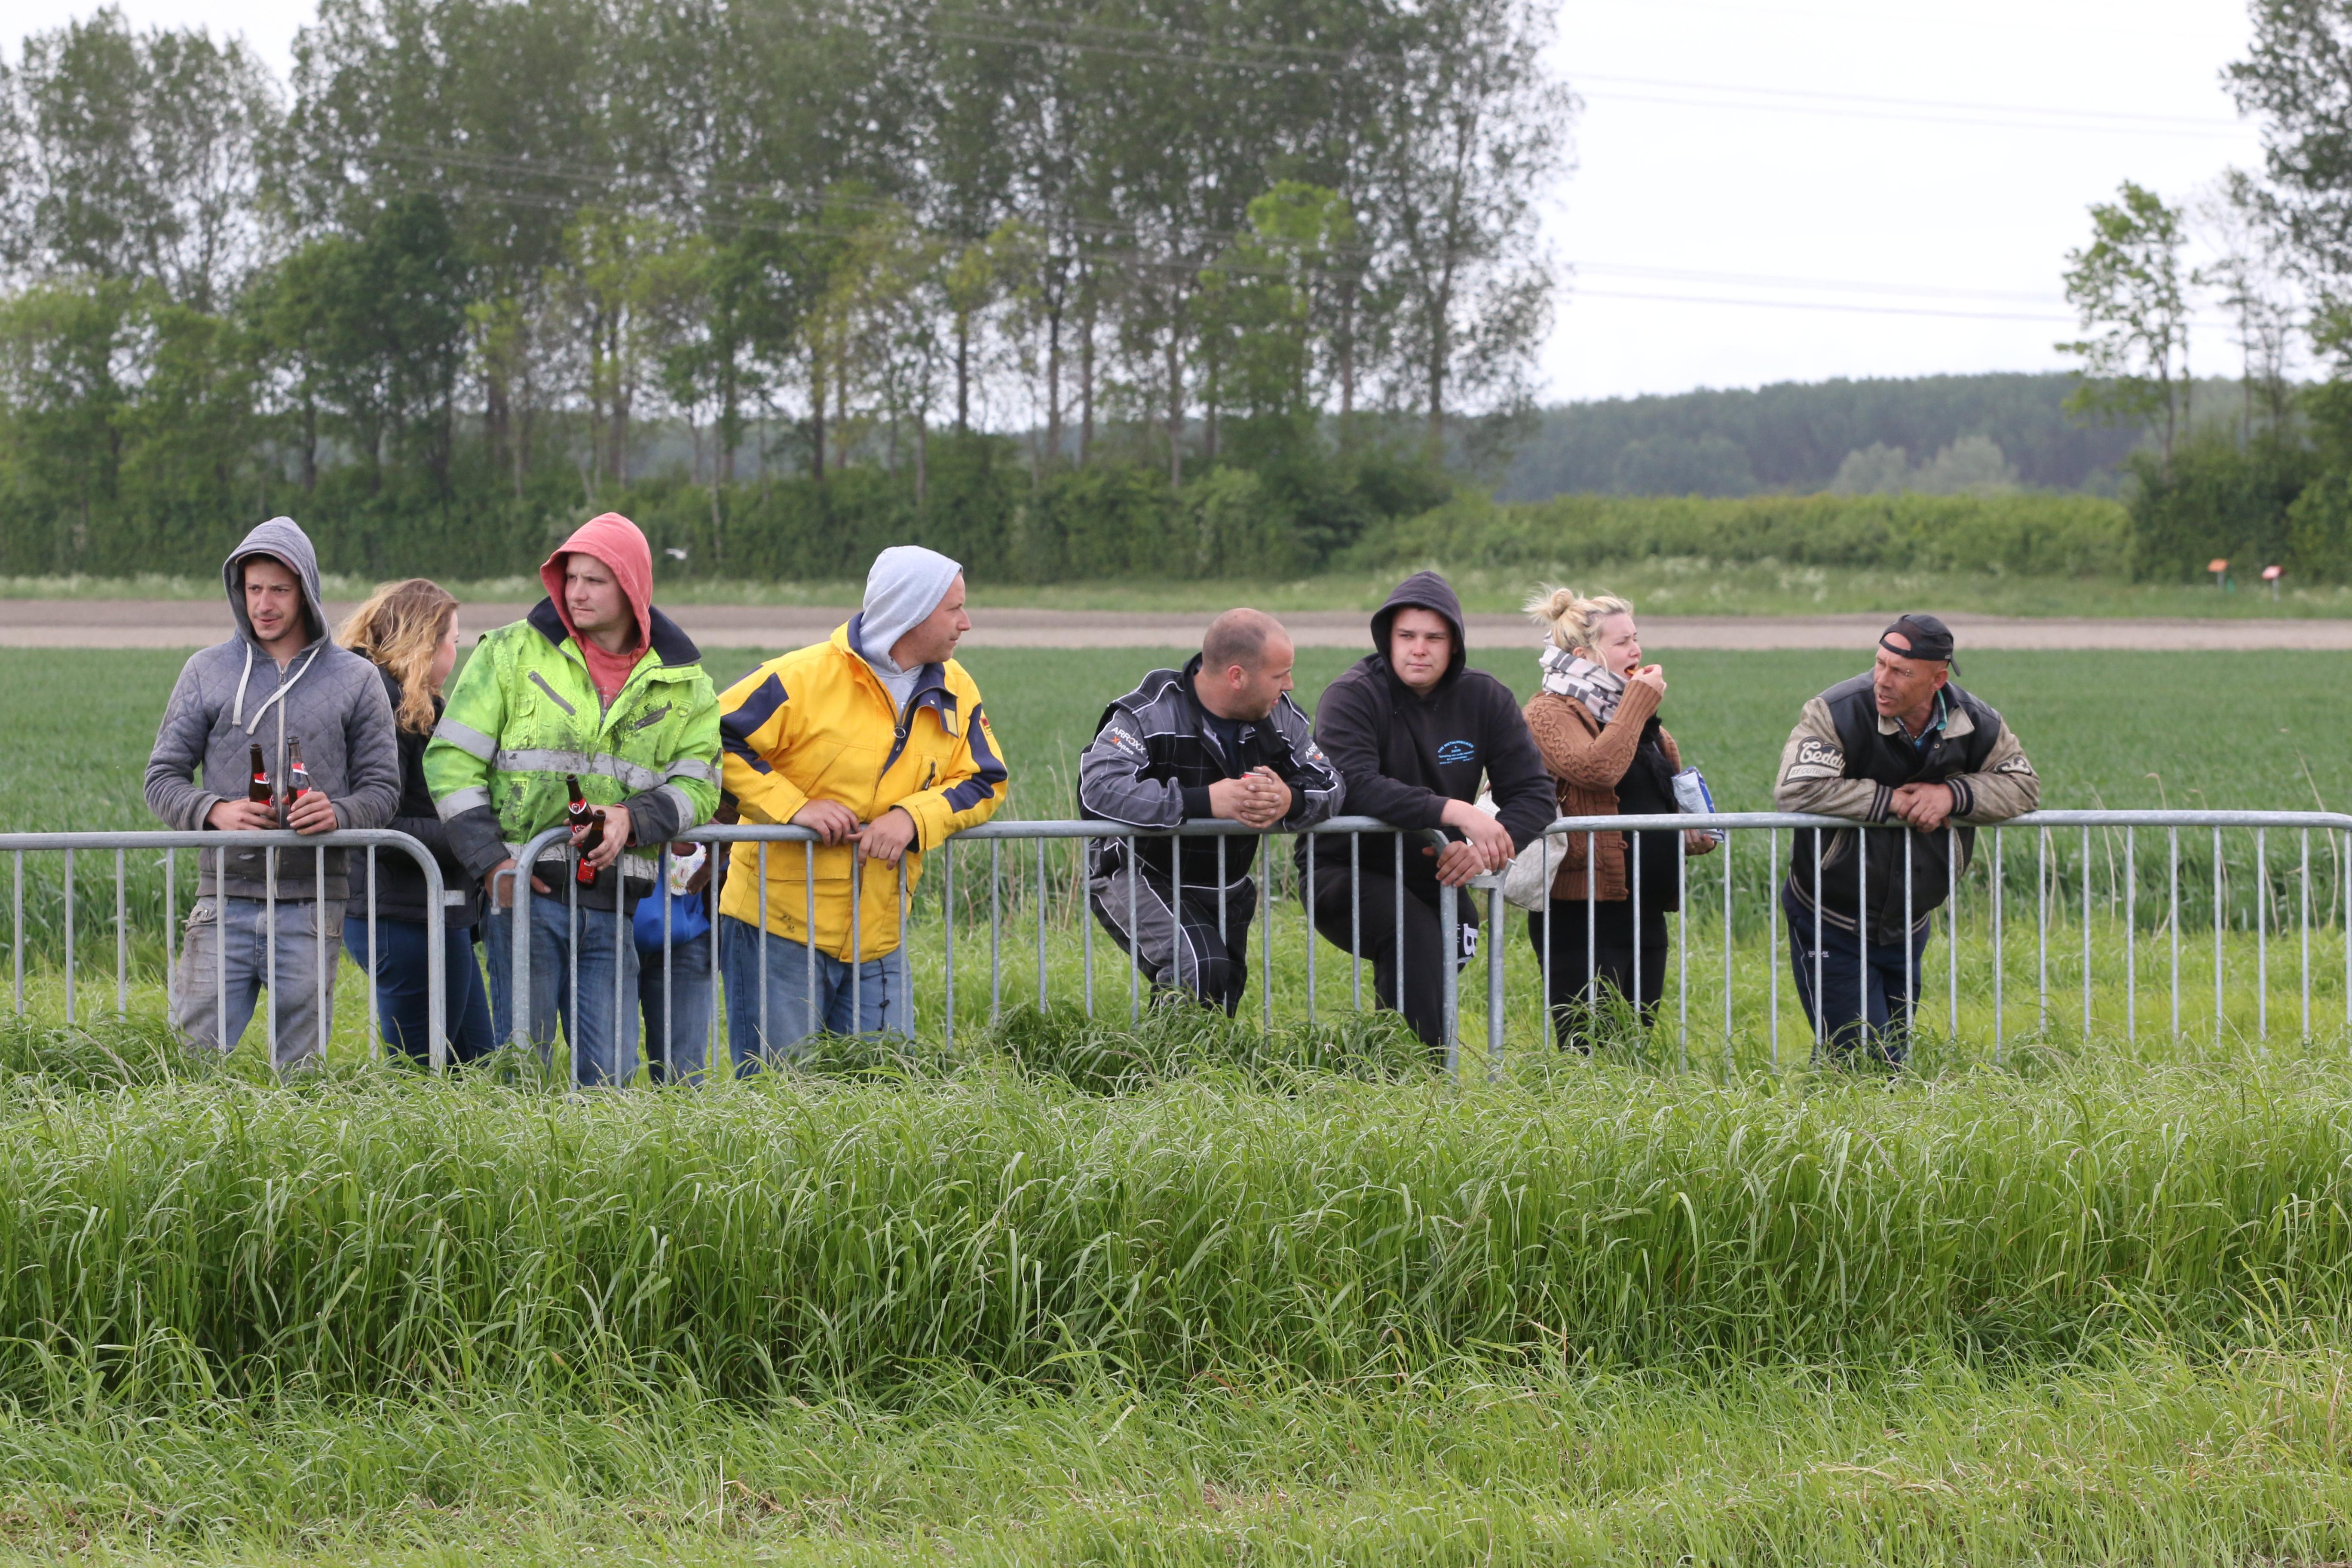 autocross sluiskil 14-5-2016 199